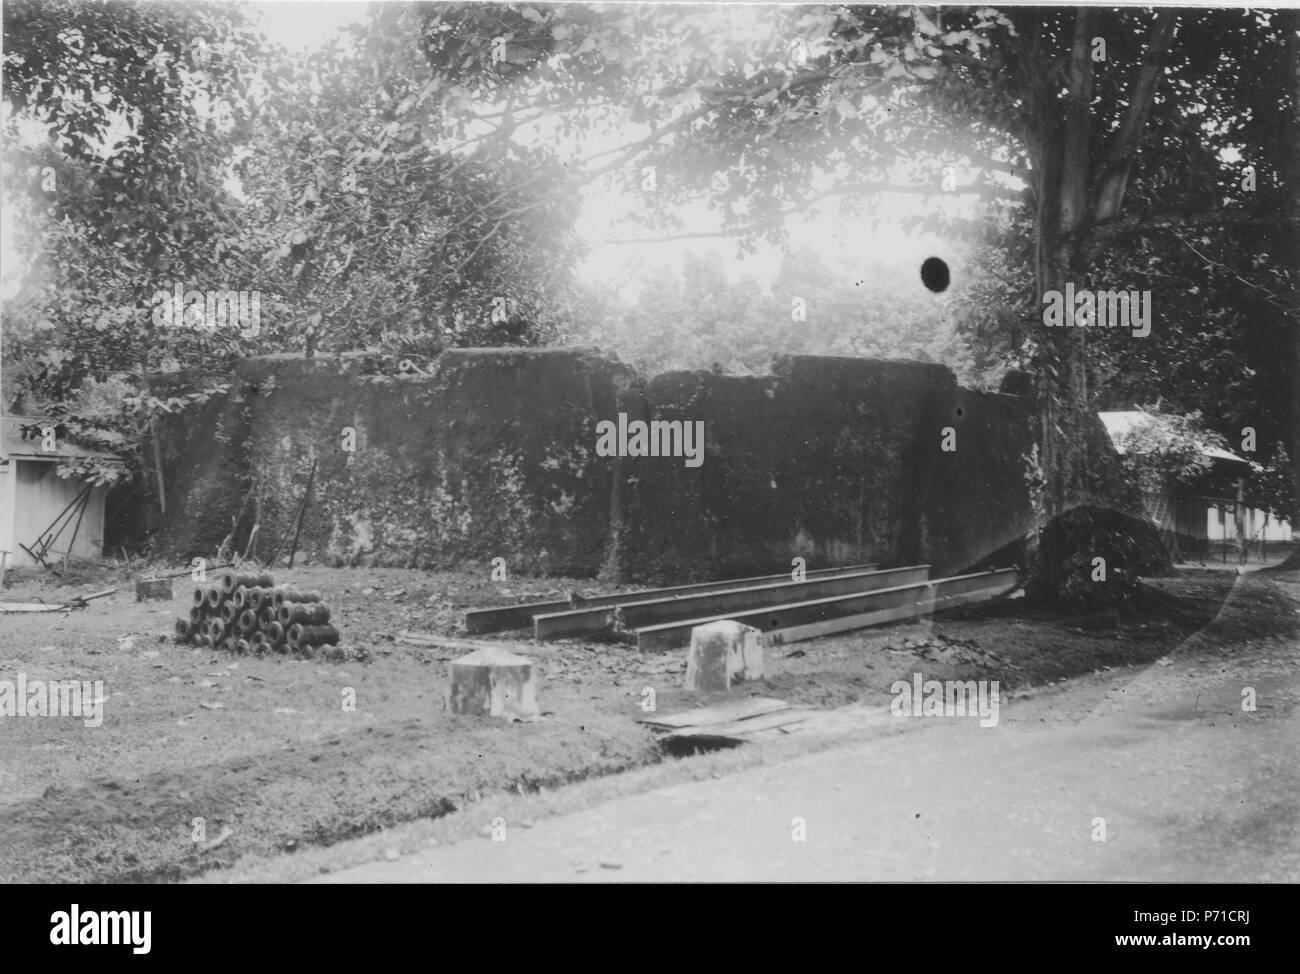 14 Gammalt fort. Sulawesi, Amurang. Indonesien - SMVK - 010669 - Stock Image